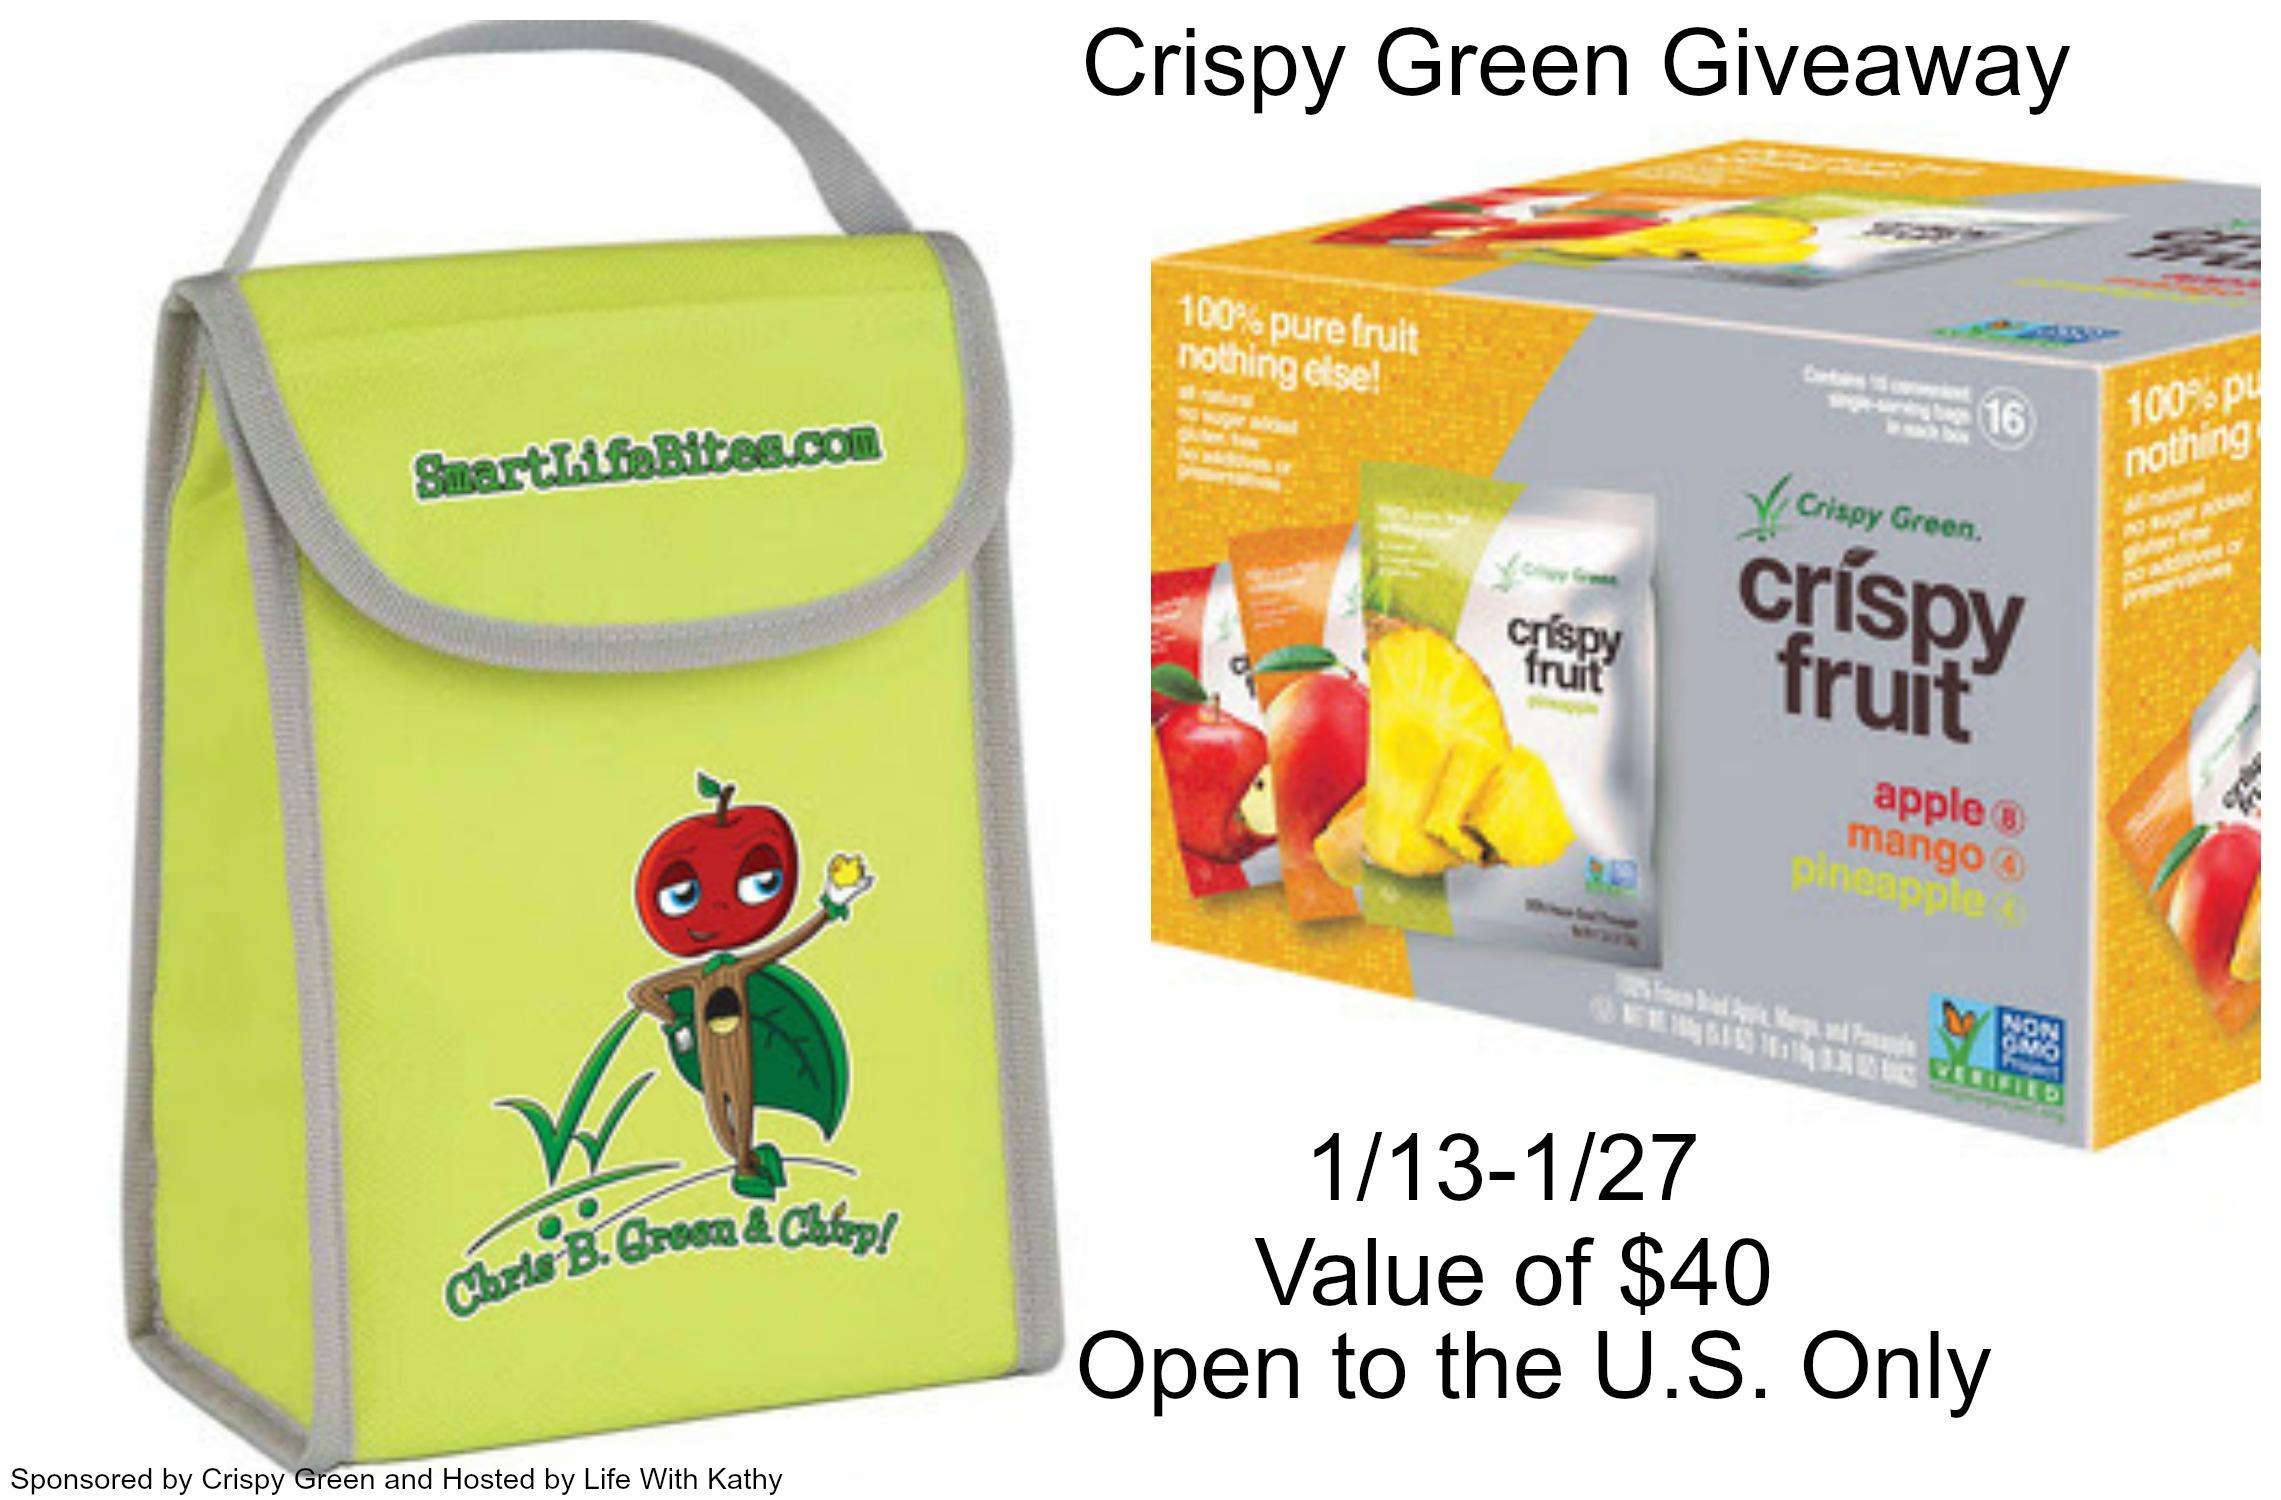 Crispy Green Giveaway